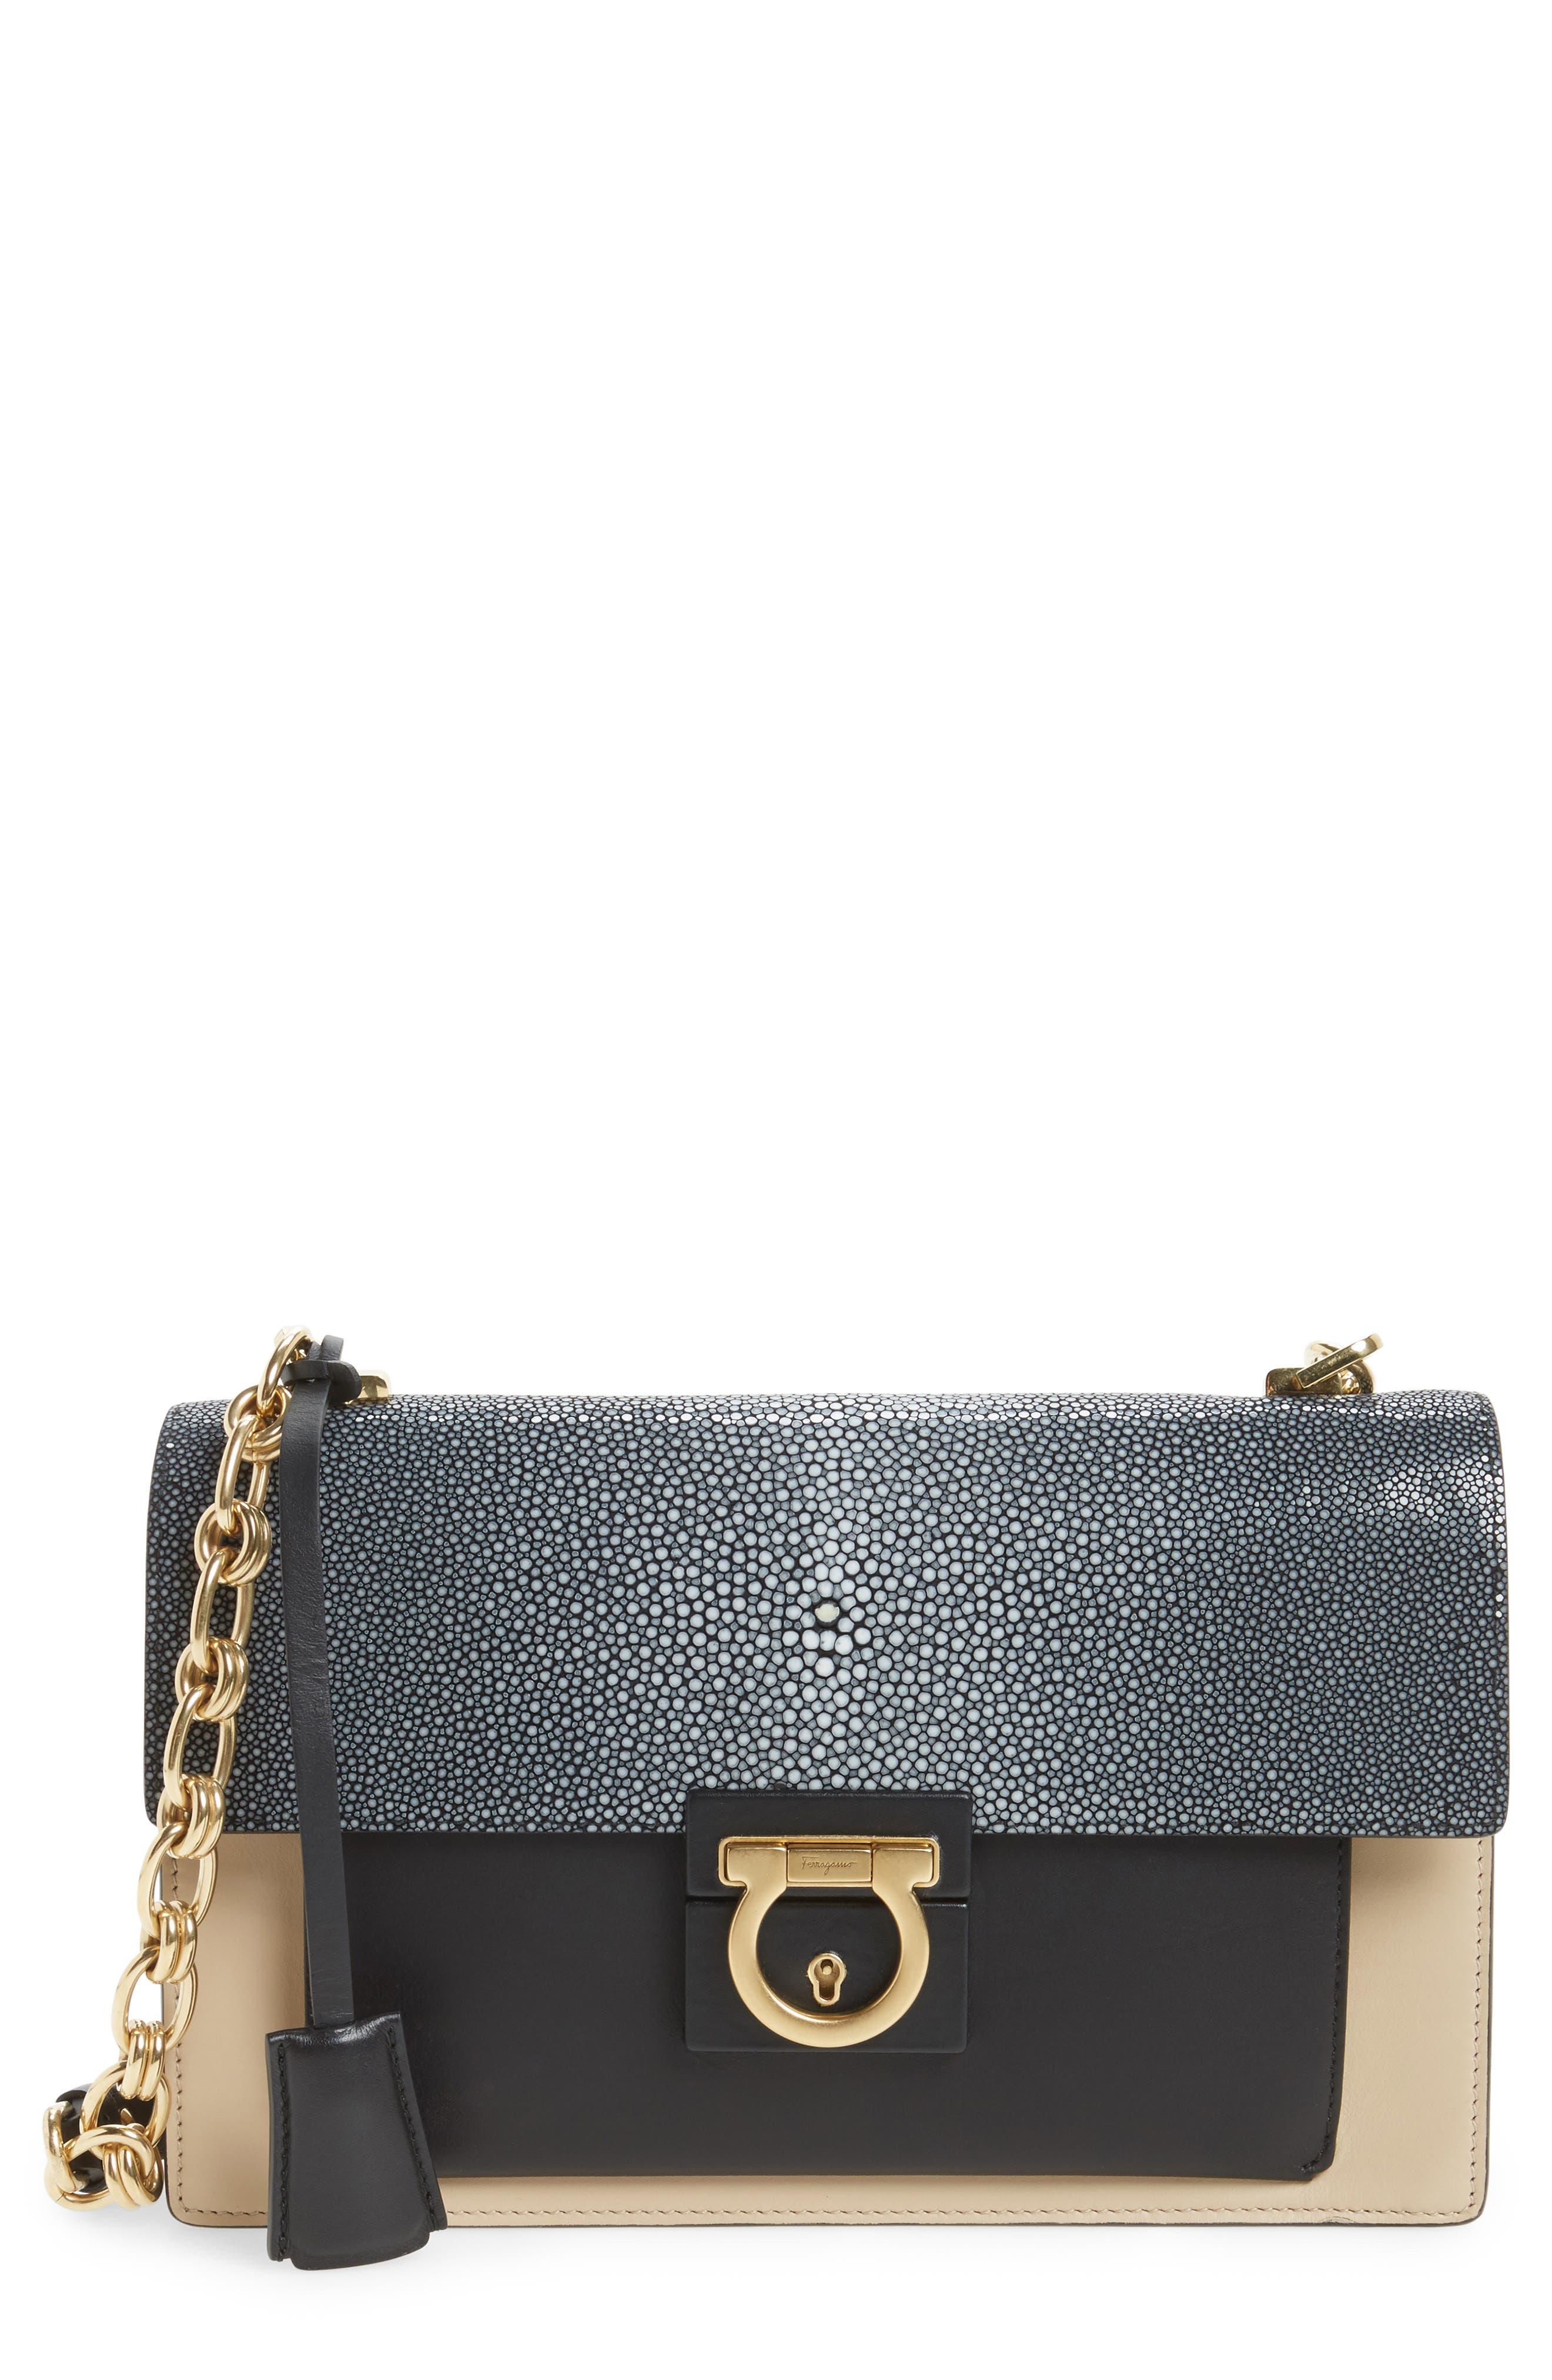 Main Image - Salvatore Ferragamo Stingray Leather Shoulder Bag